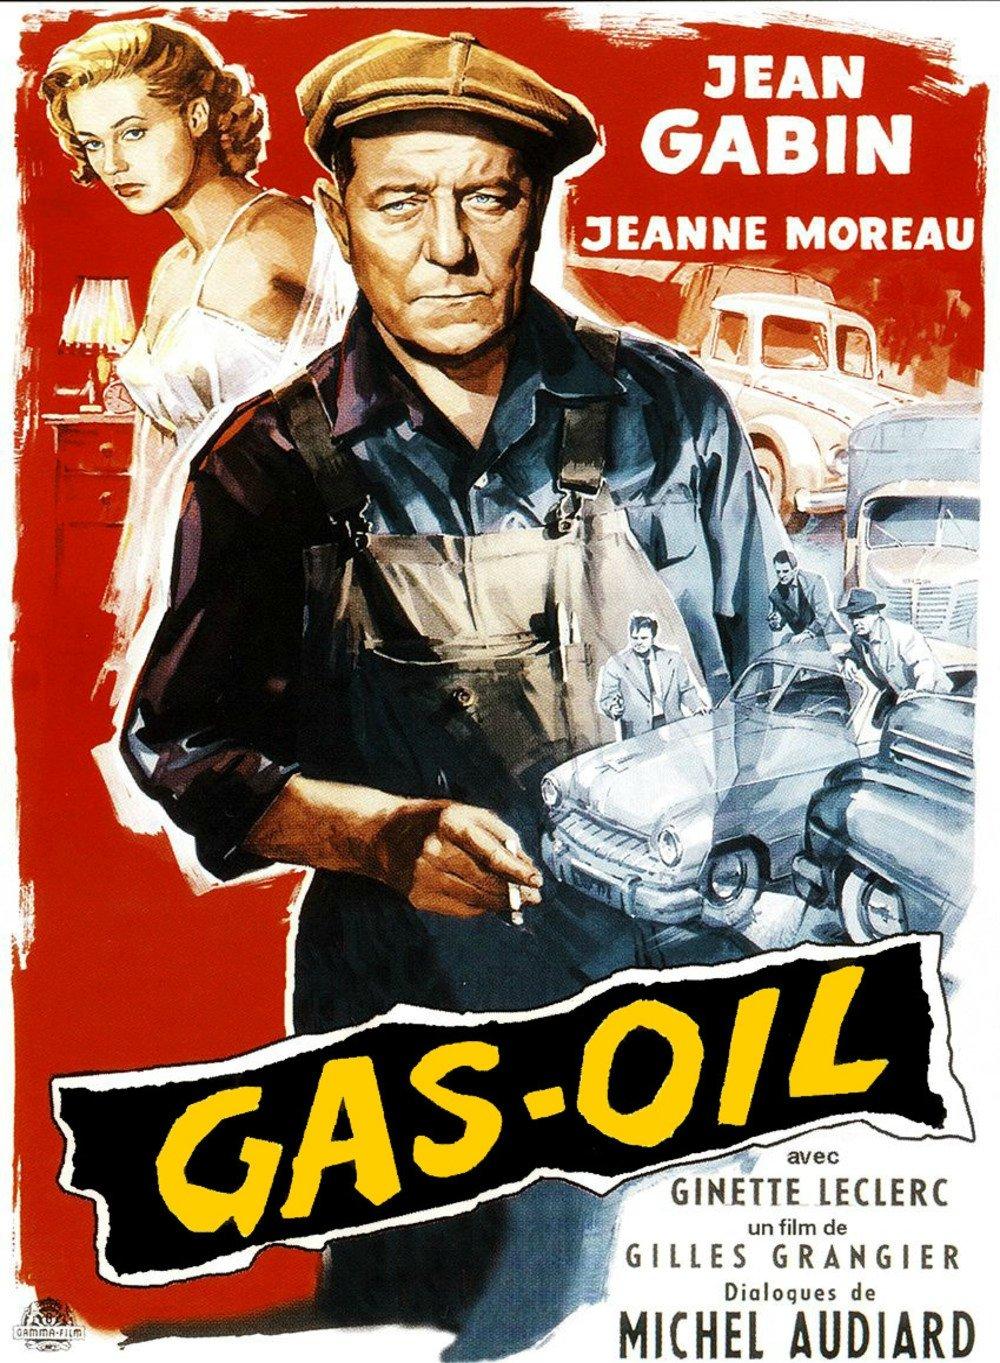 Gas-oil (1955)